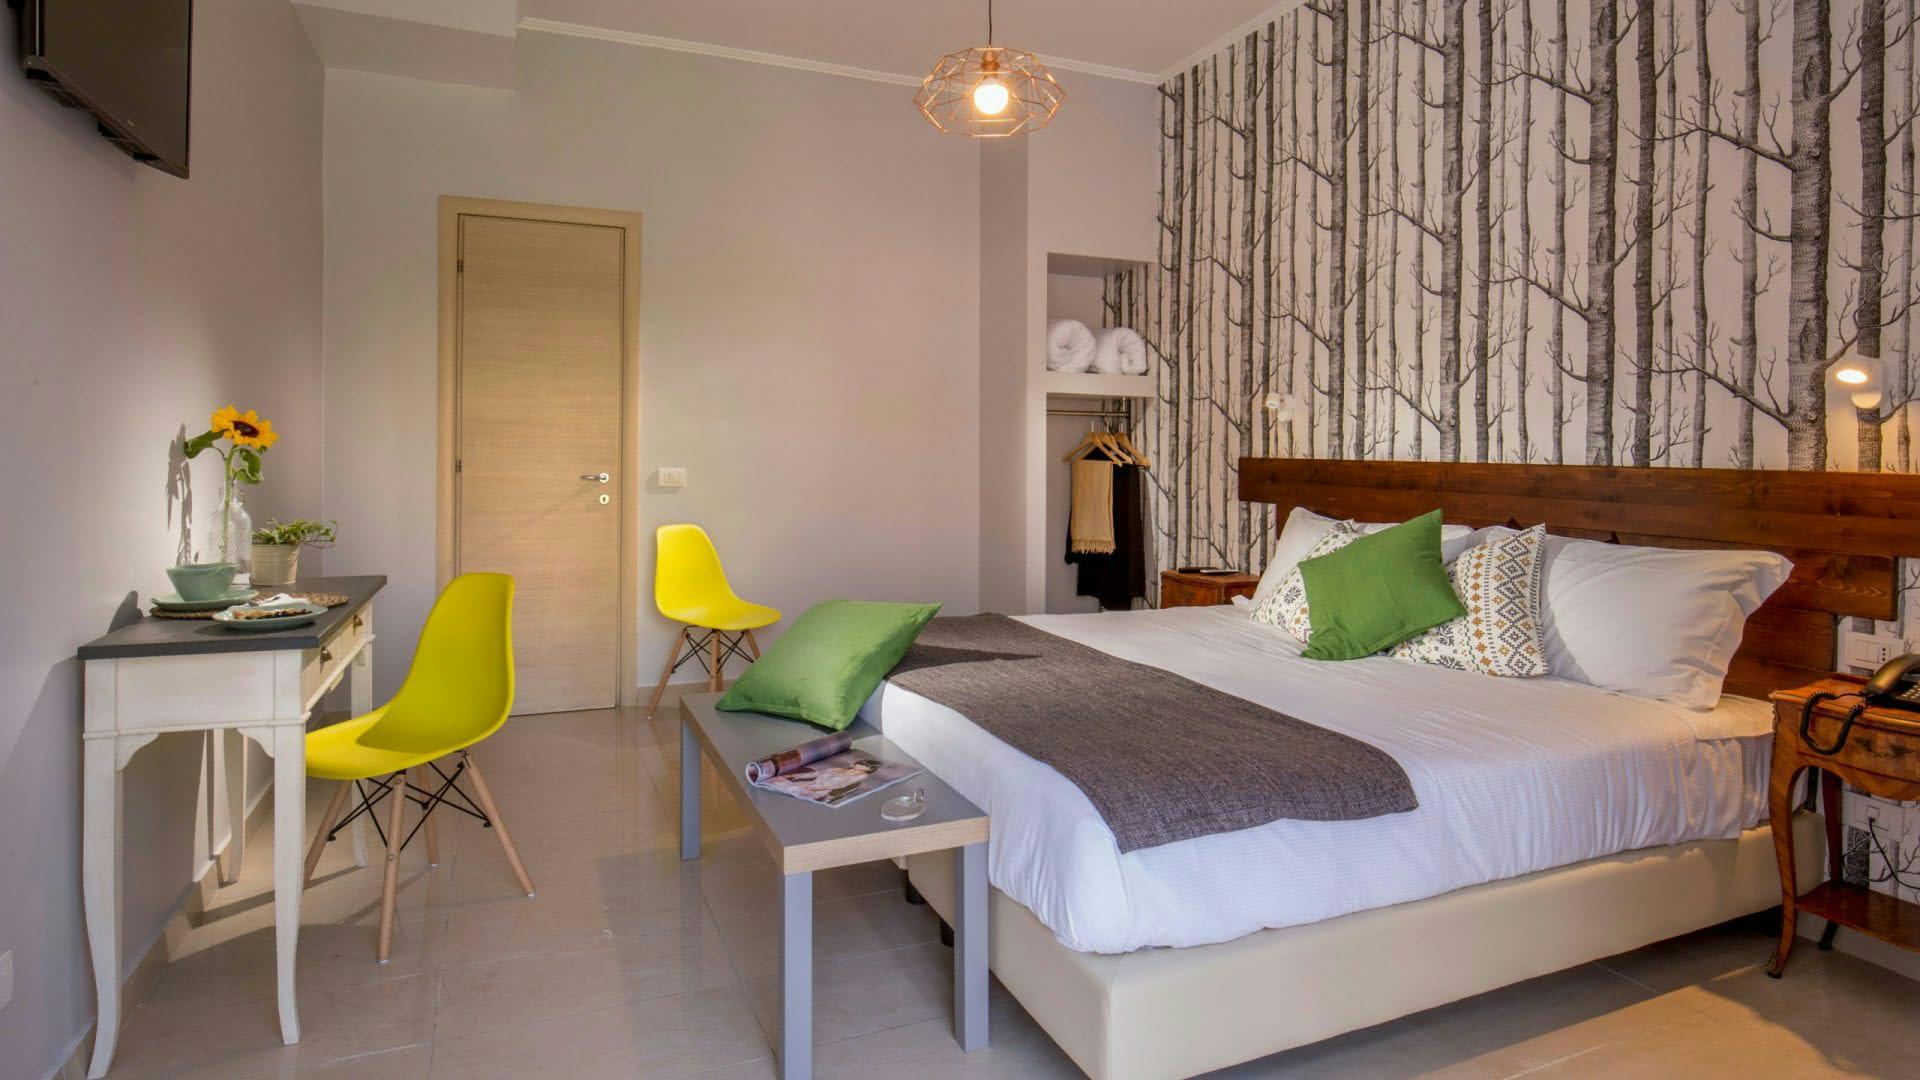 urbangarden-hotel-rome-rooms-09